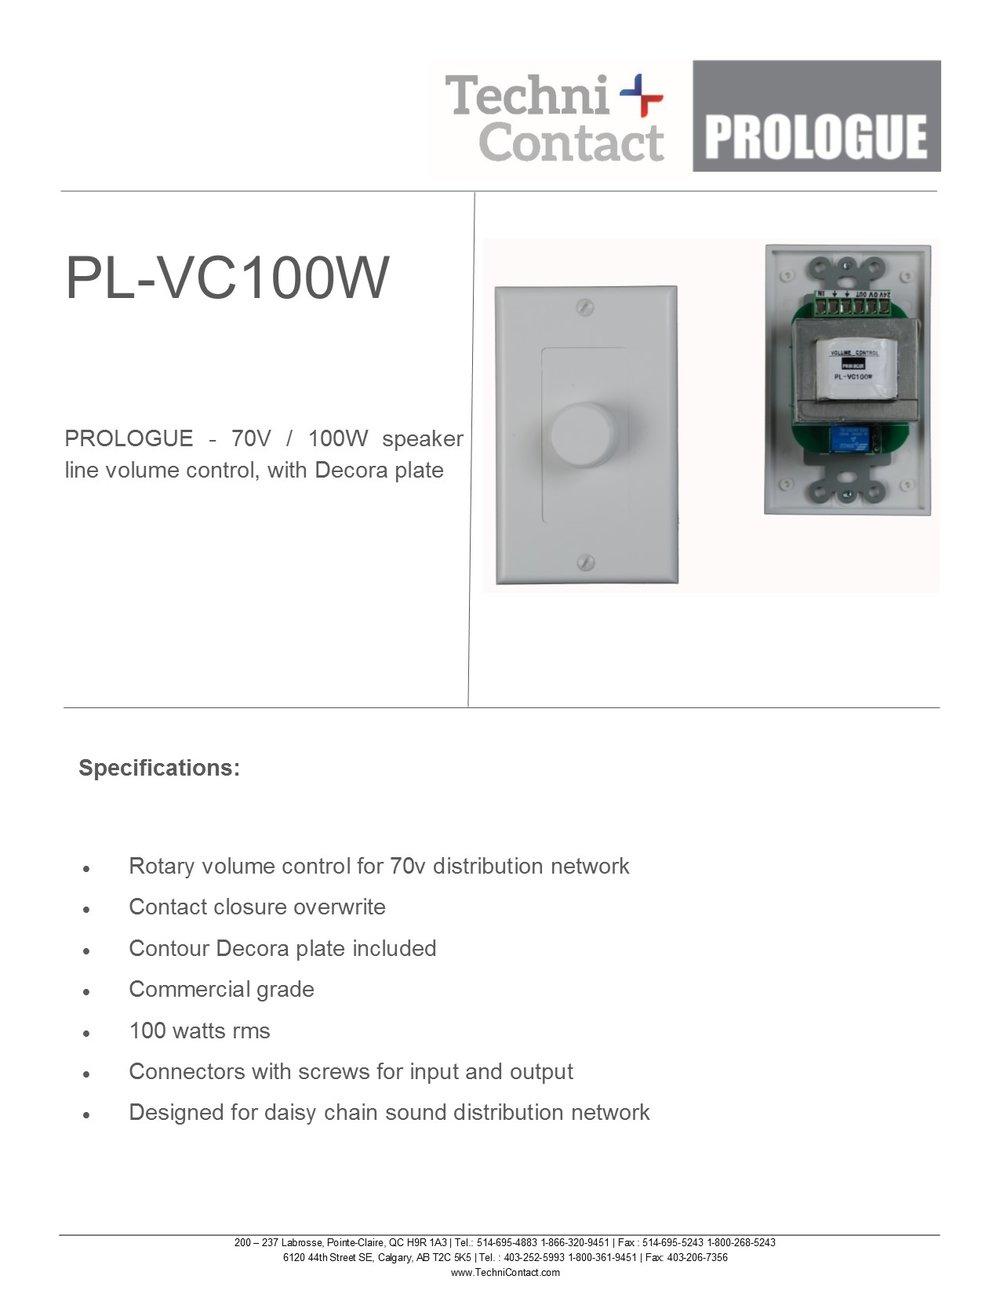 Prologue_PL-VC100W_SPECS.jpg